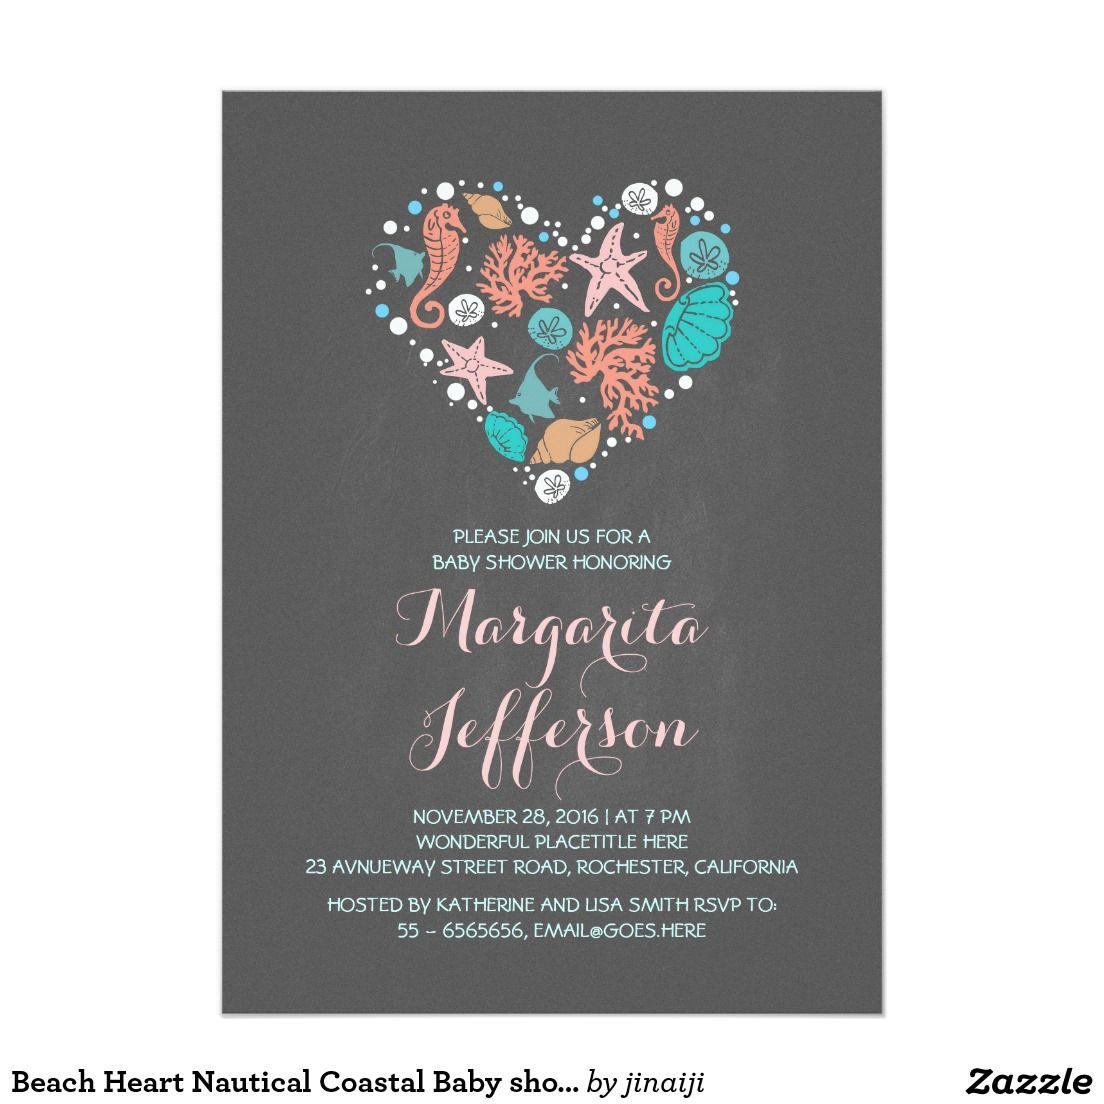 Beach Heart Nautical Coastal Baby shower Card Beautiful ocean ...